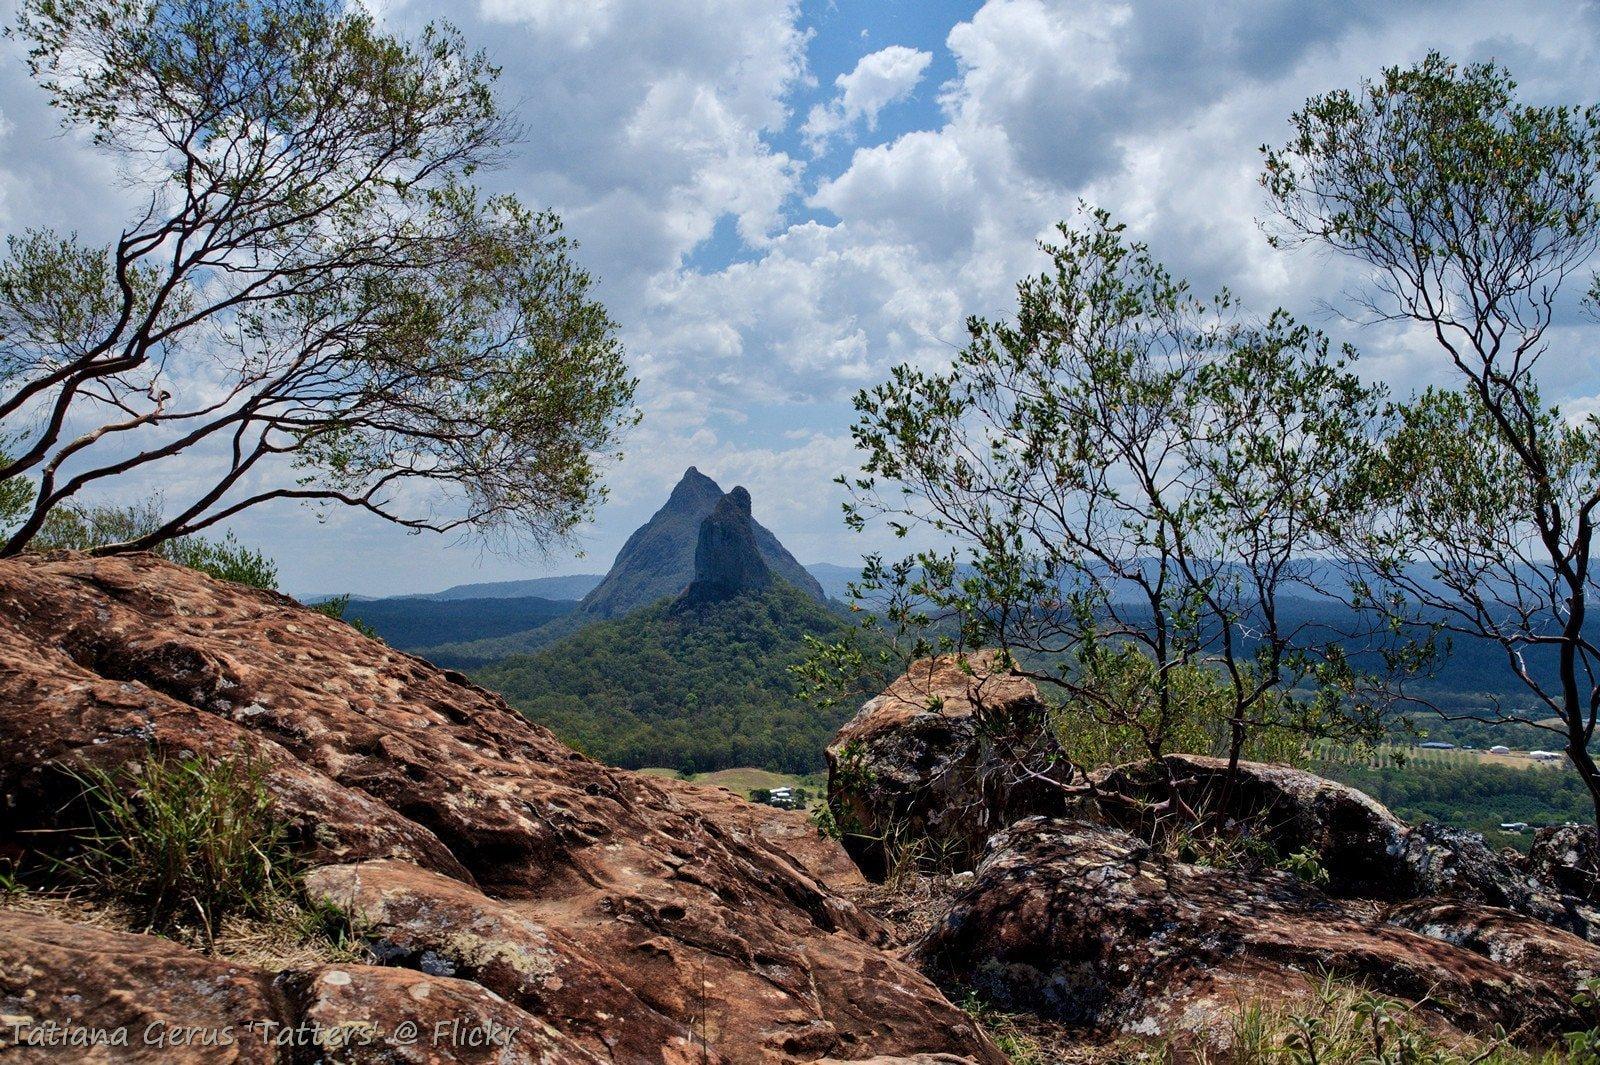 Mount Ngungun © Flickr / Tatters